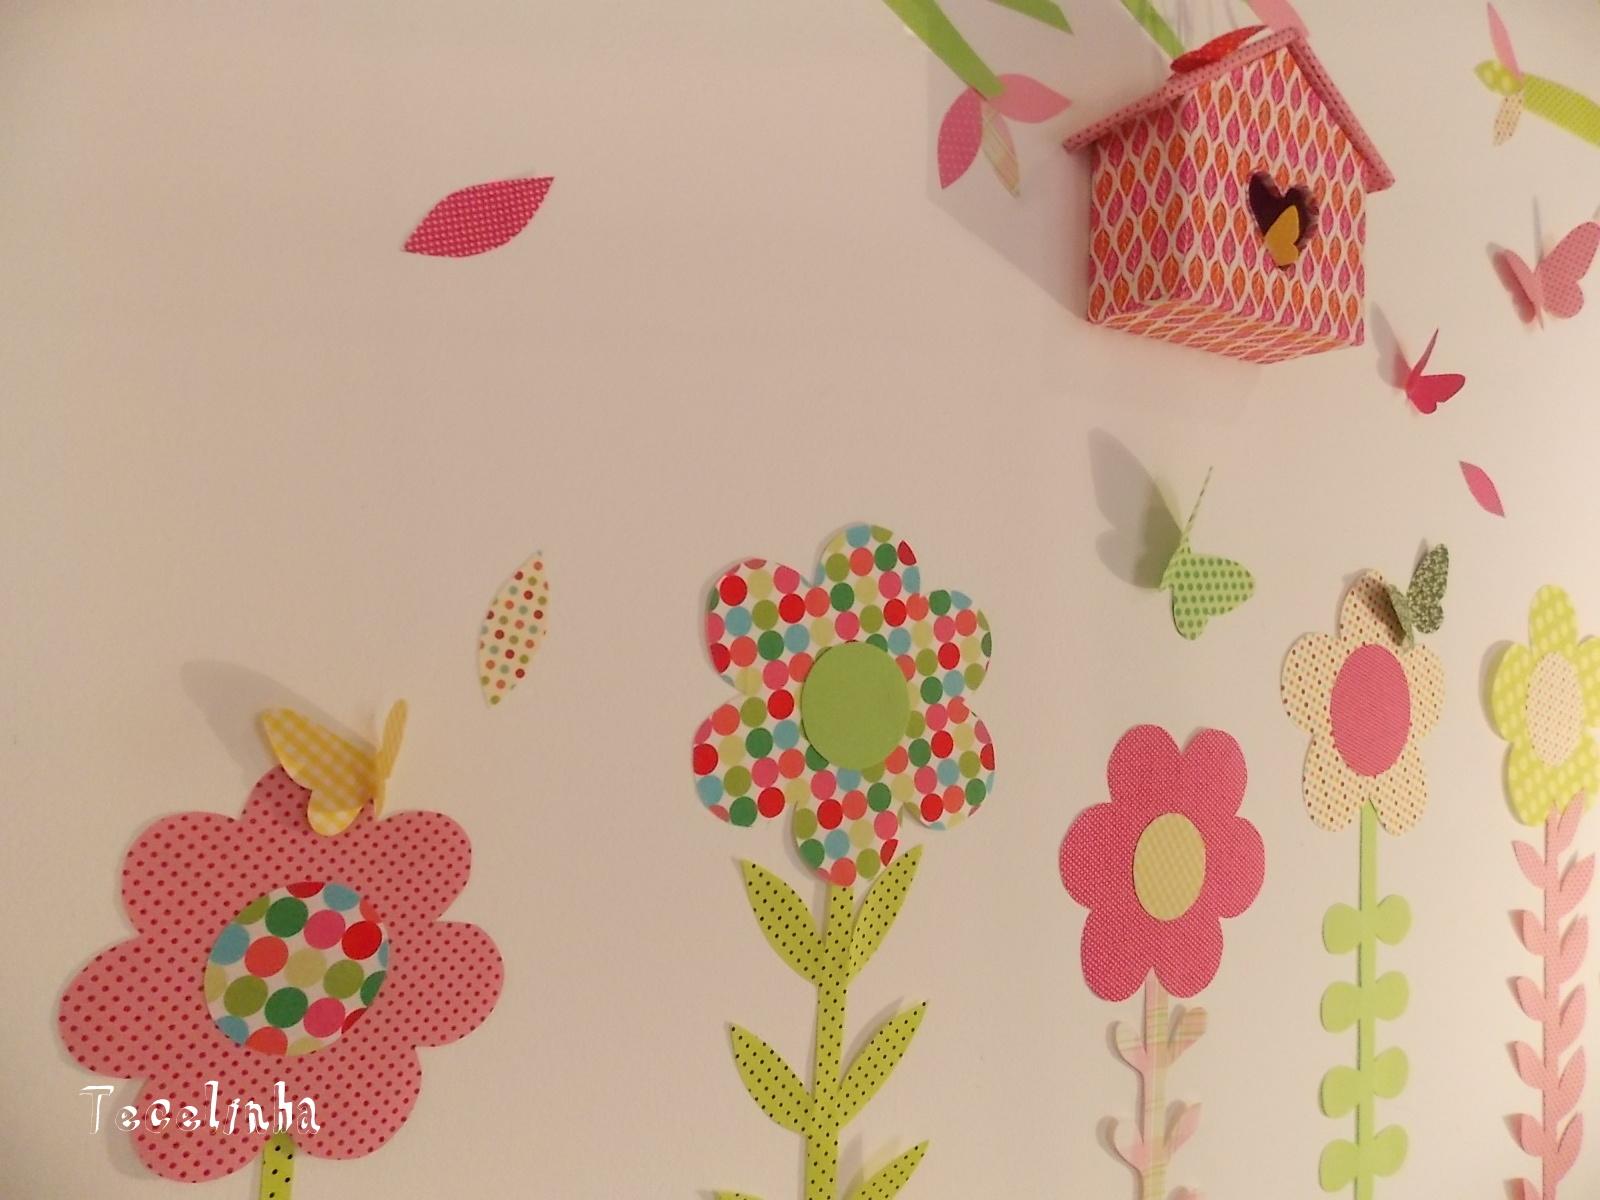 decoracao quarto de bebe jardim encantado : decoracao quarto de bebe jardim encantado: de tecido maternidade jardim encantado adesivos de tecido bebe